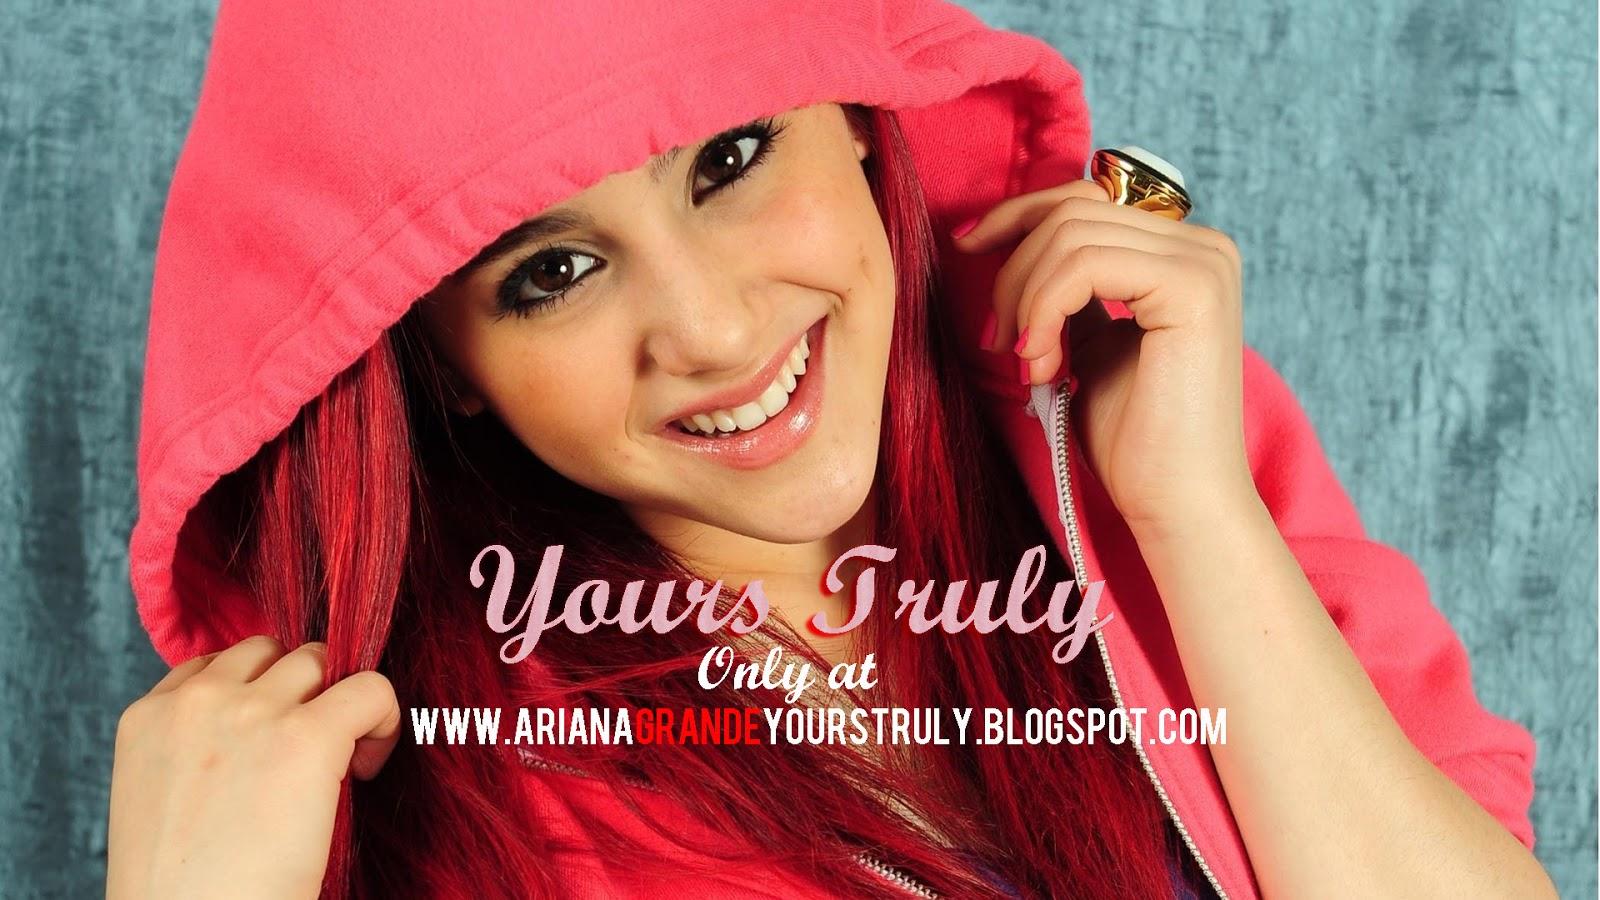 ariana grande leaked photos